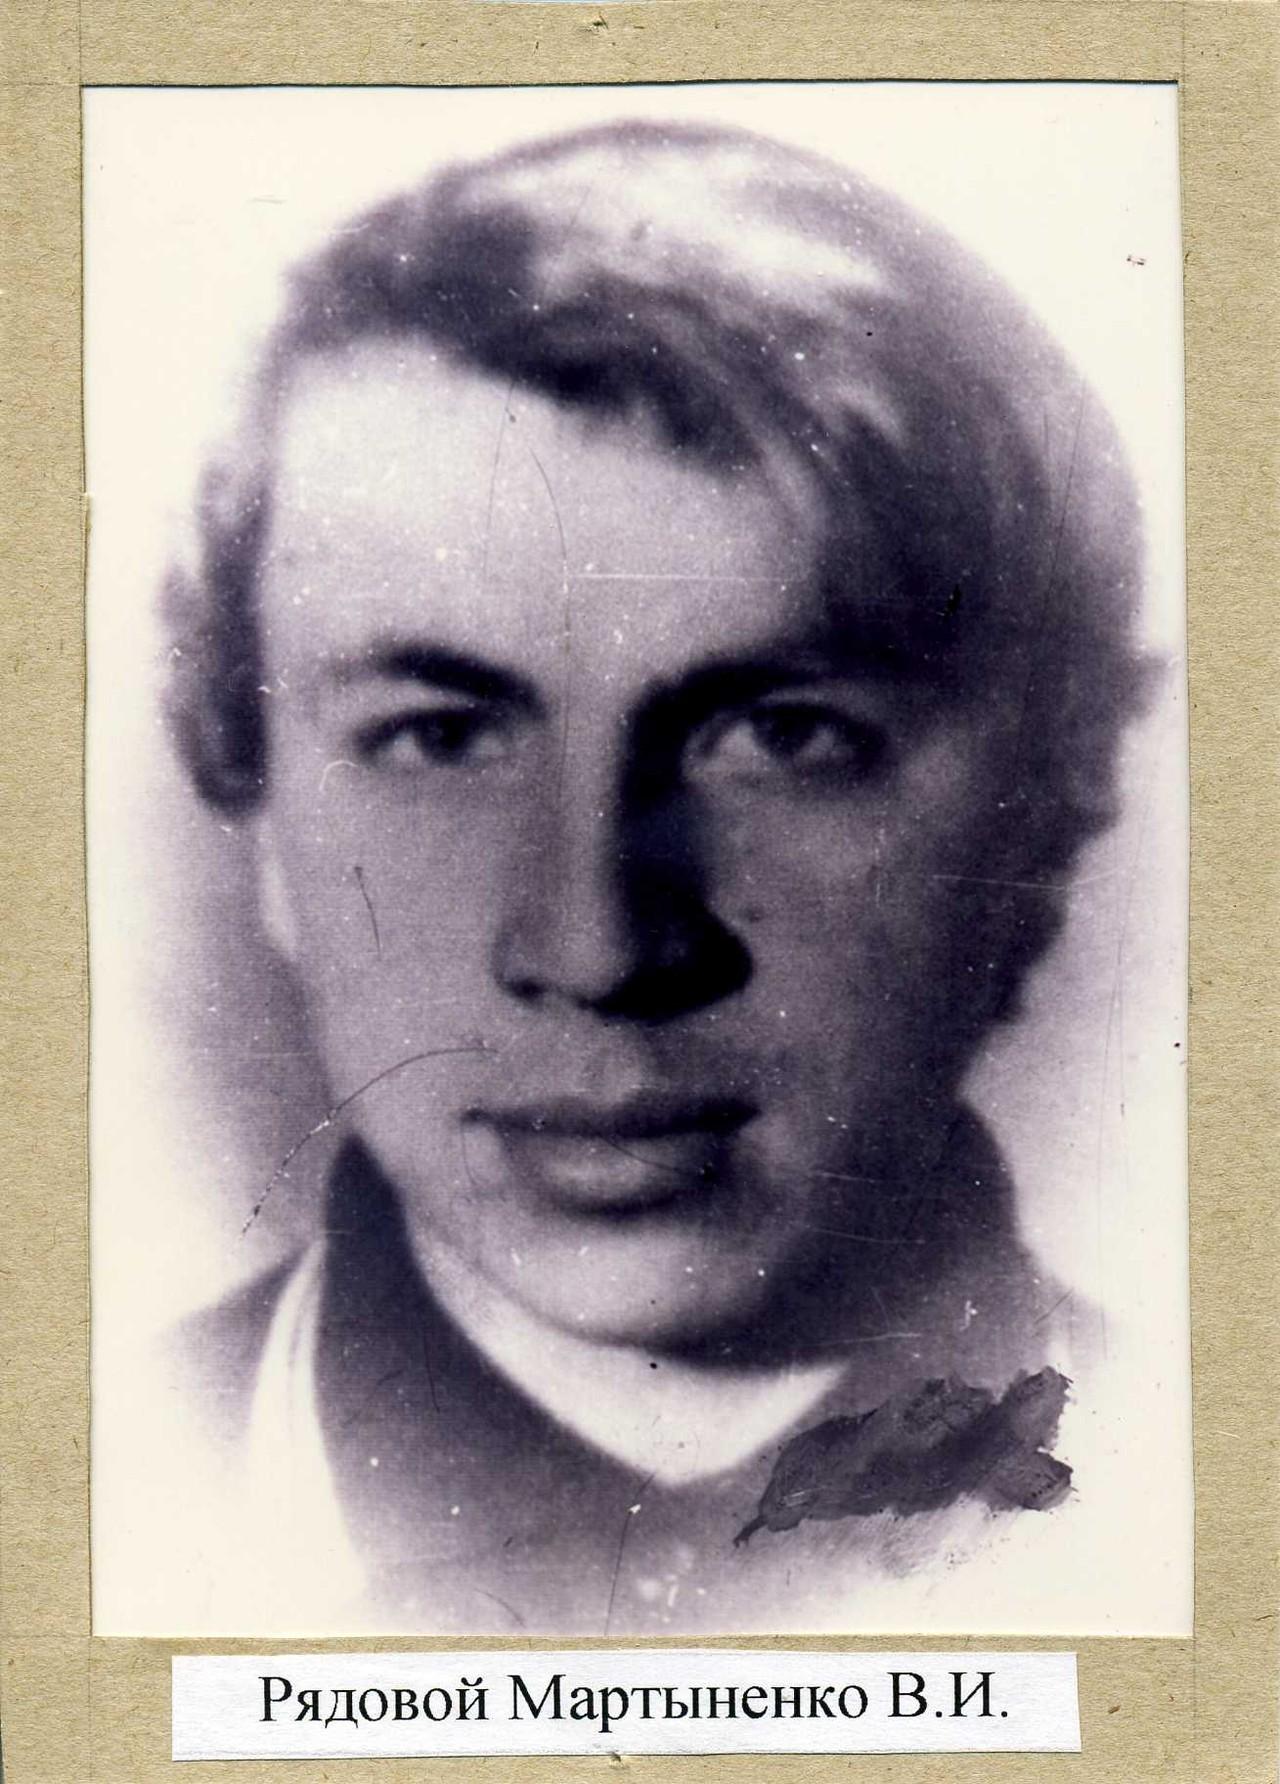 Мартыненко Василий Иванович